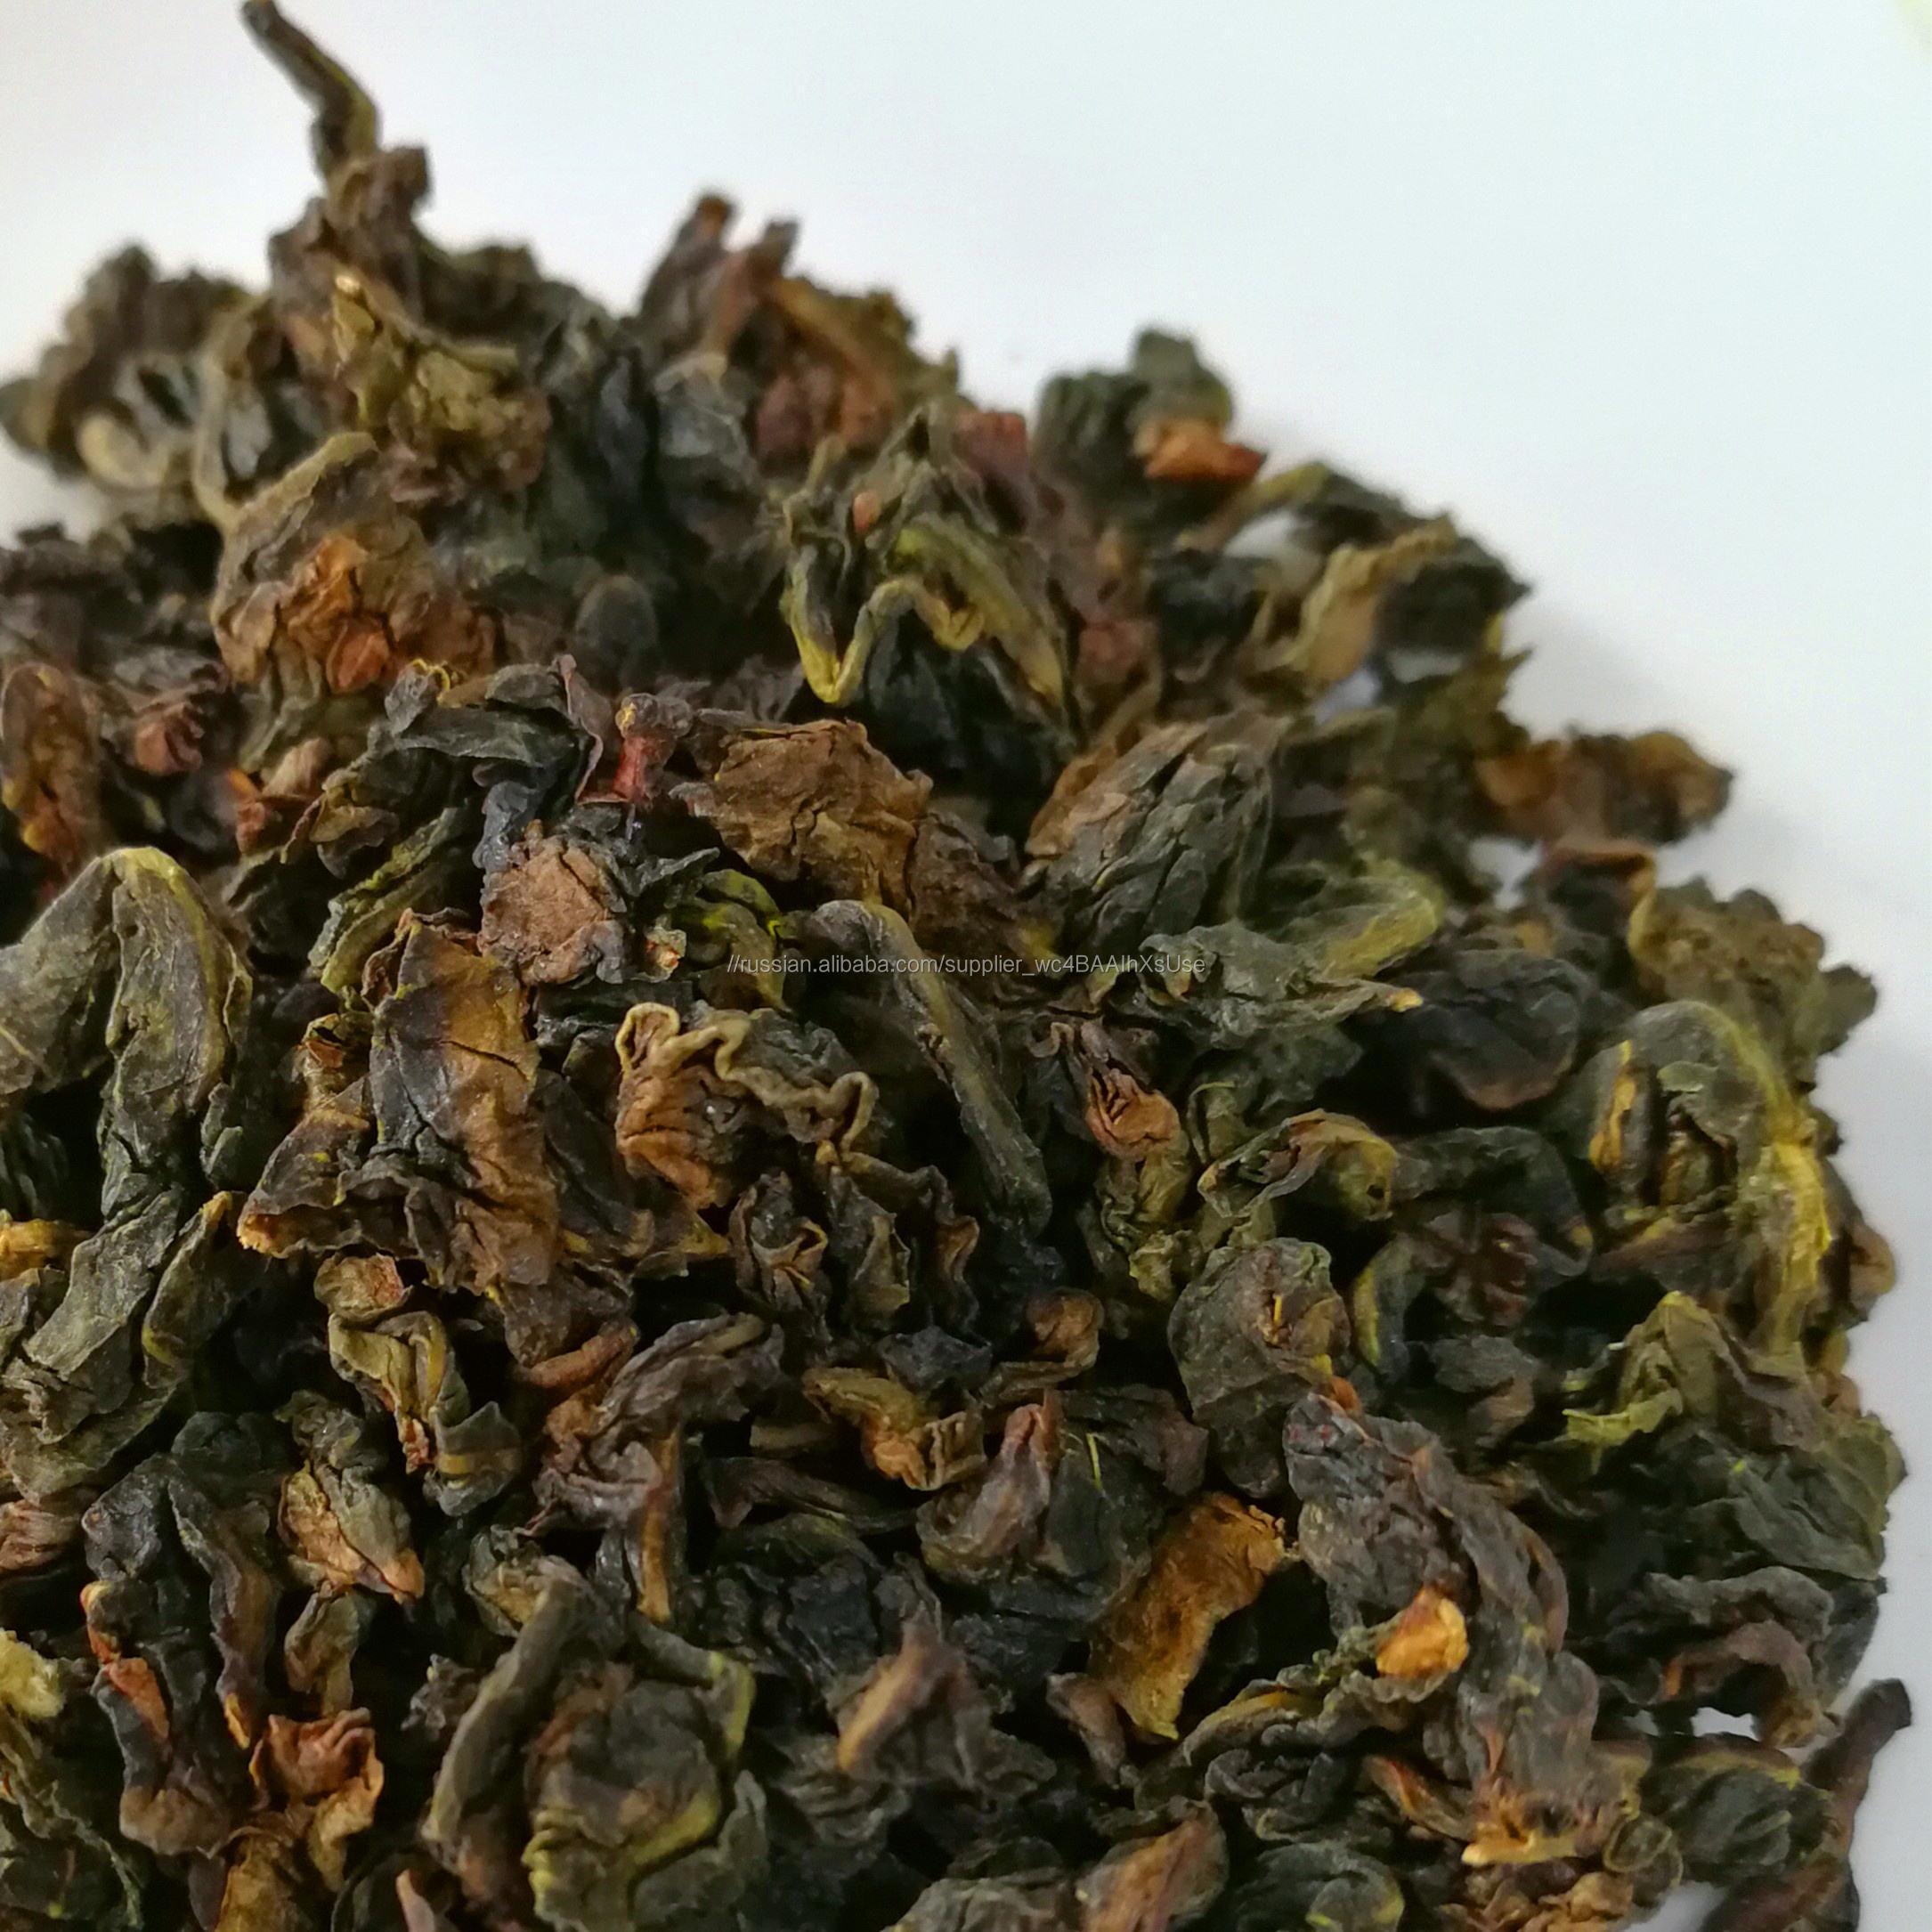 Премиум Китай галстук Гуань Инь чай из Фуцзянь <span class=keywords><strong>ANXI</strong></span>